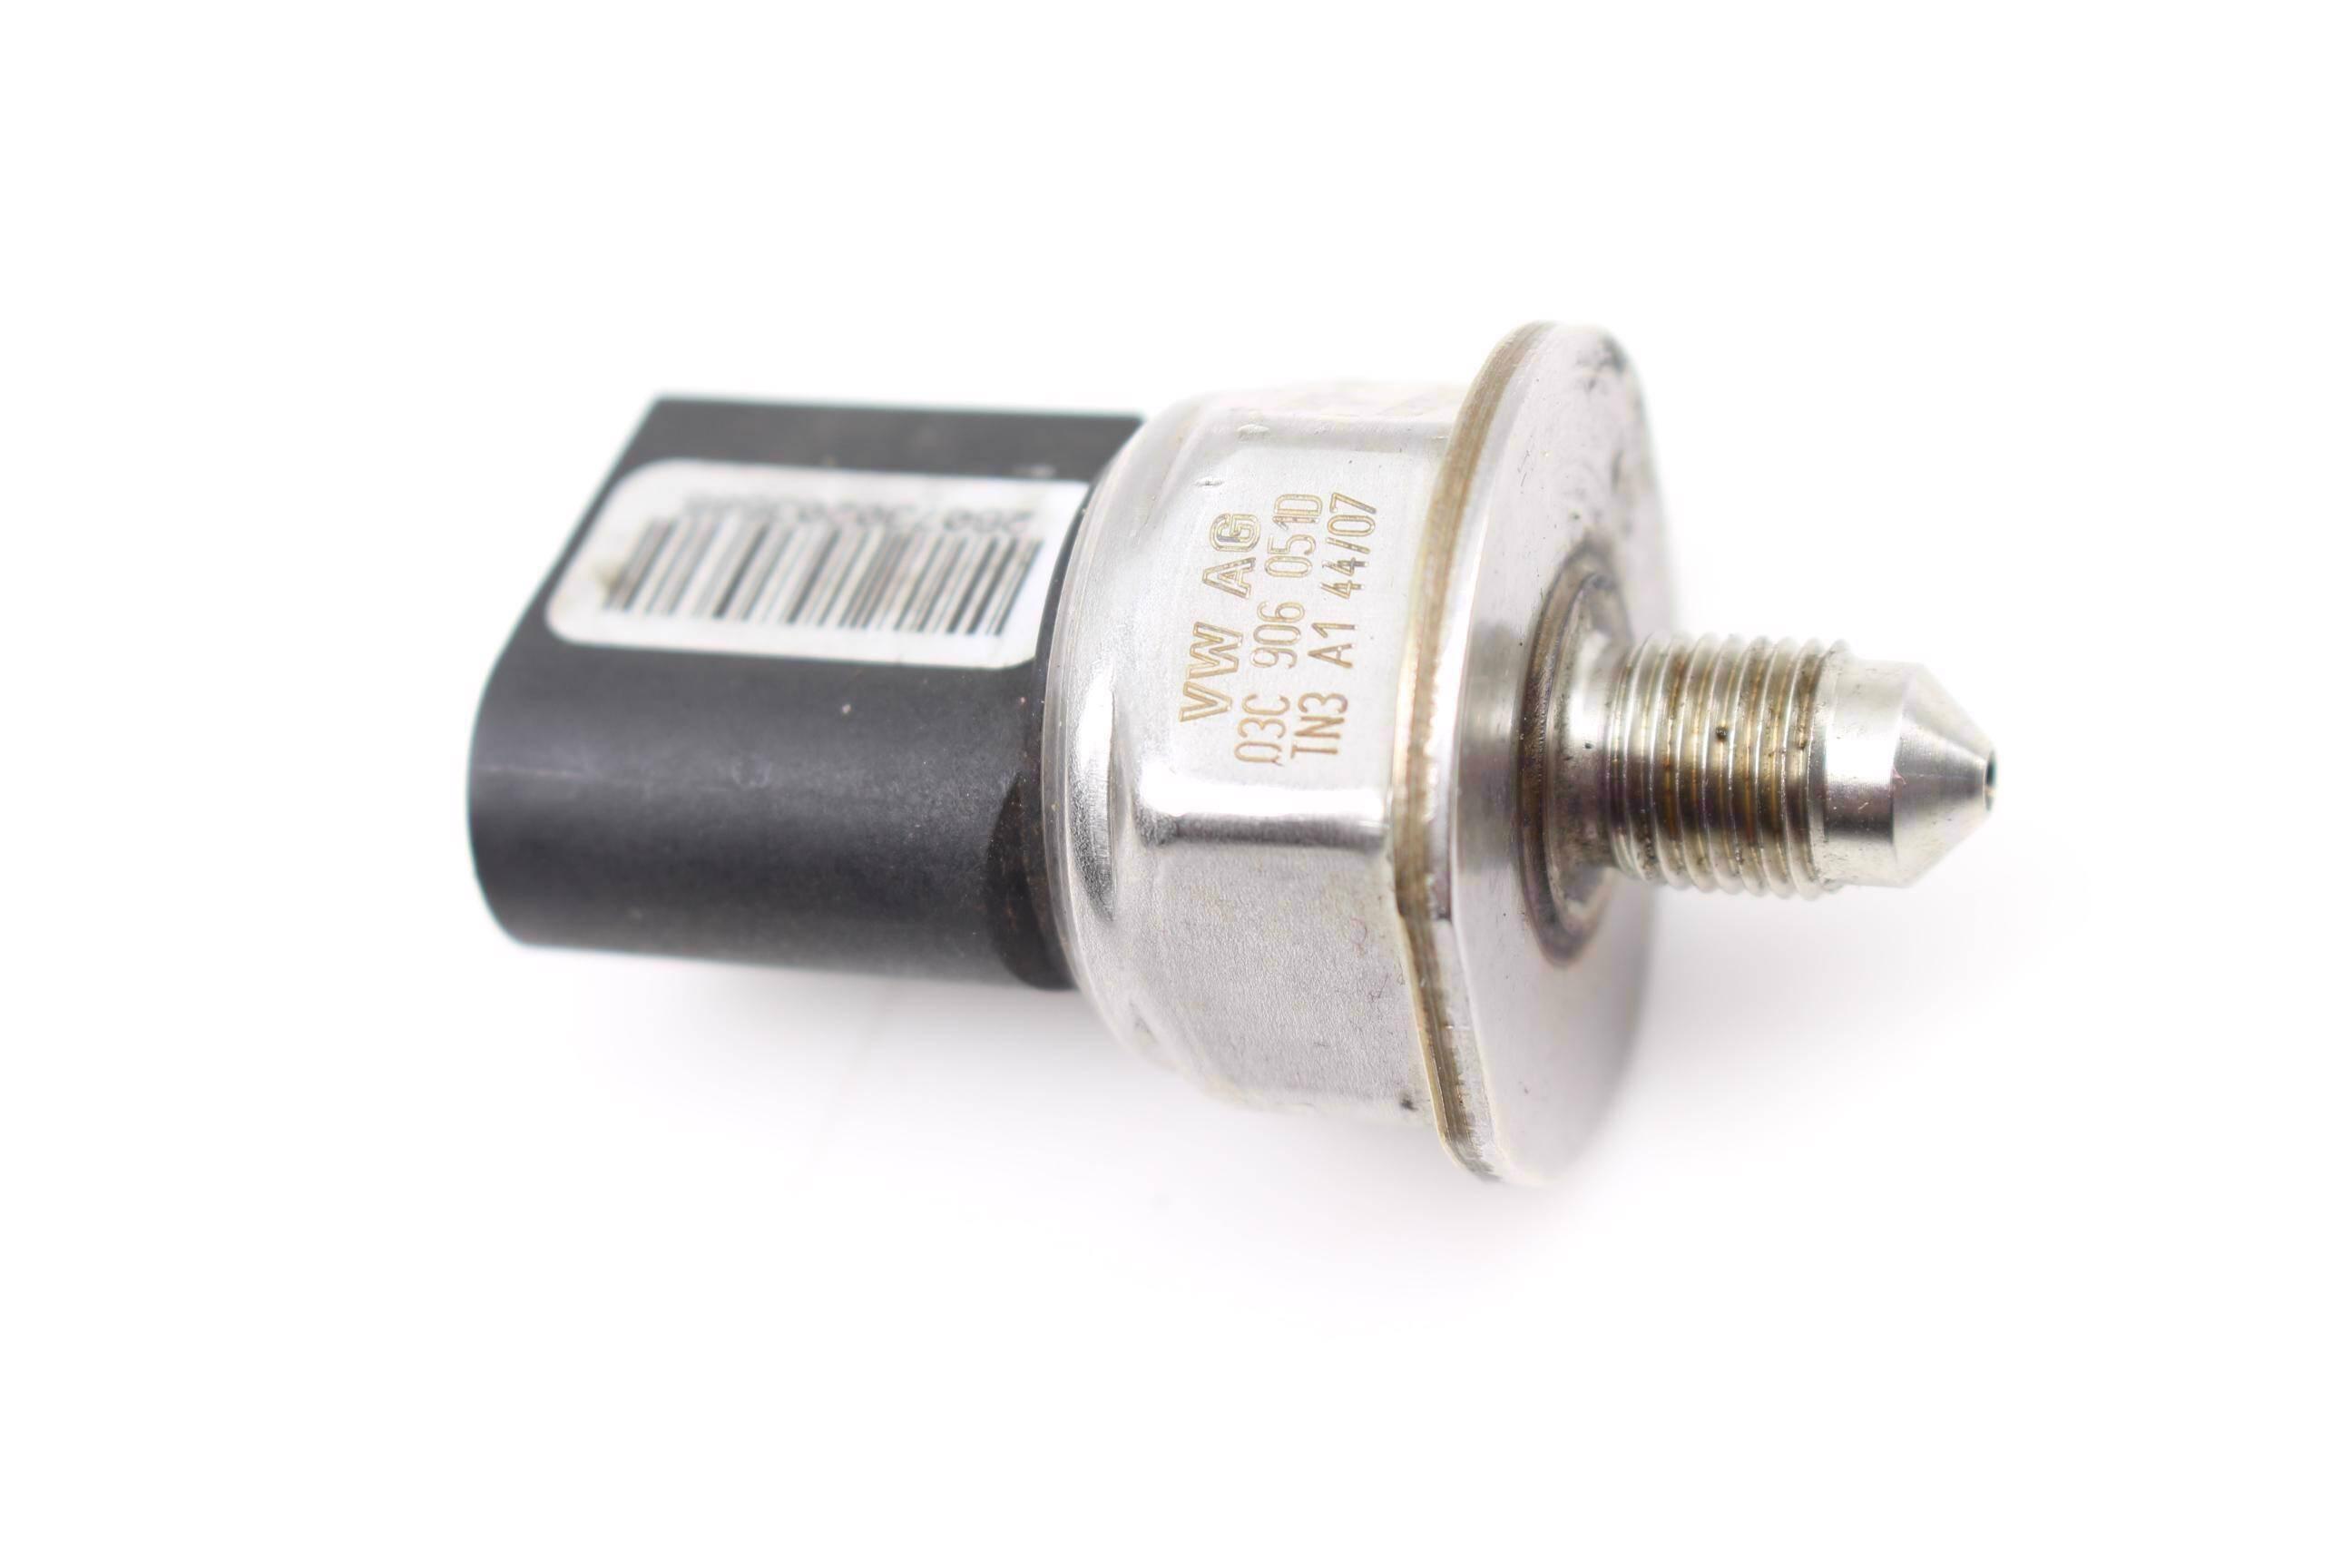 2006 Vw Passat 36 Fuel Pressure Sensor Location